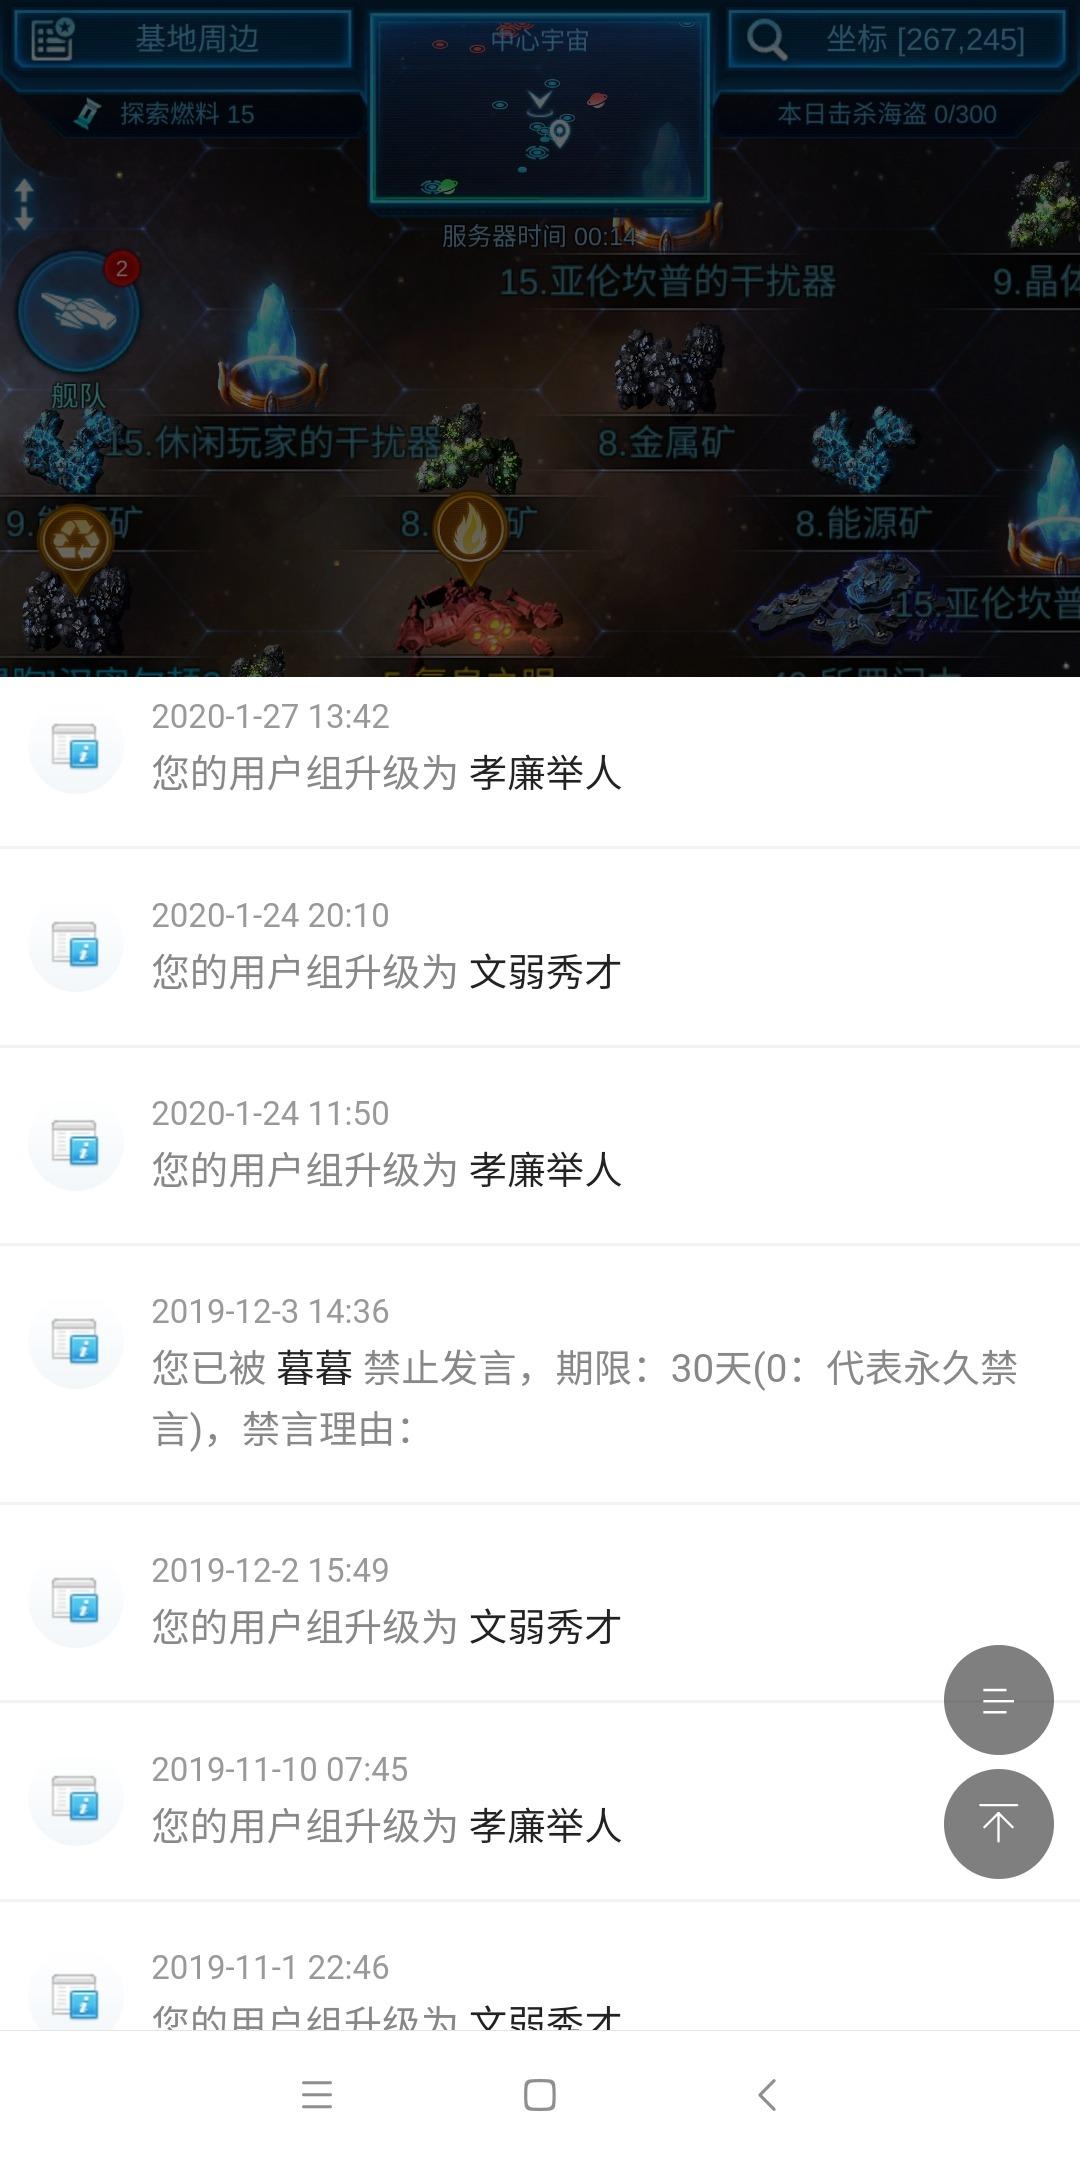 Screenshot_2020-04-13-00-14-49-753_com.jedigames.p16s.luobo.jpg